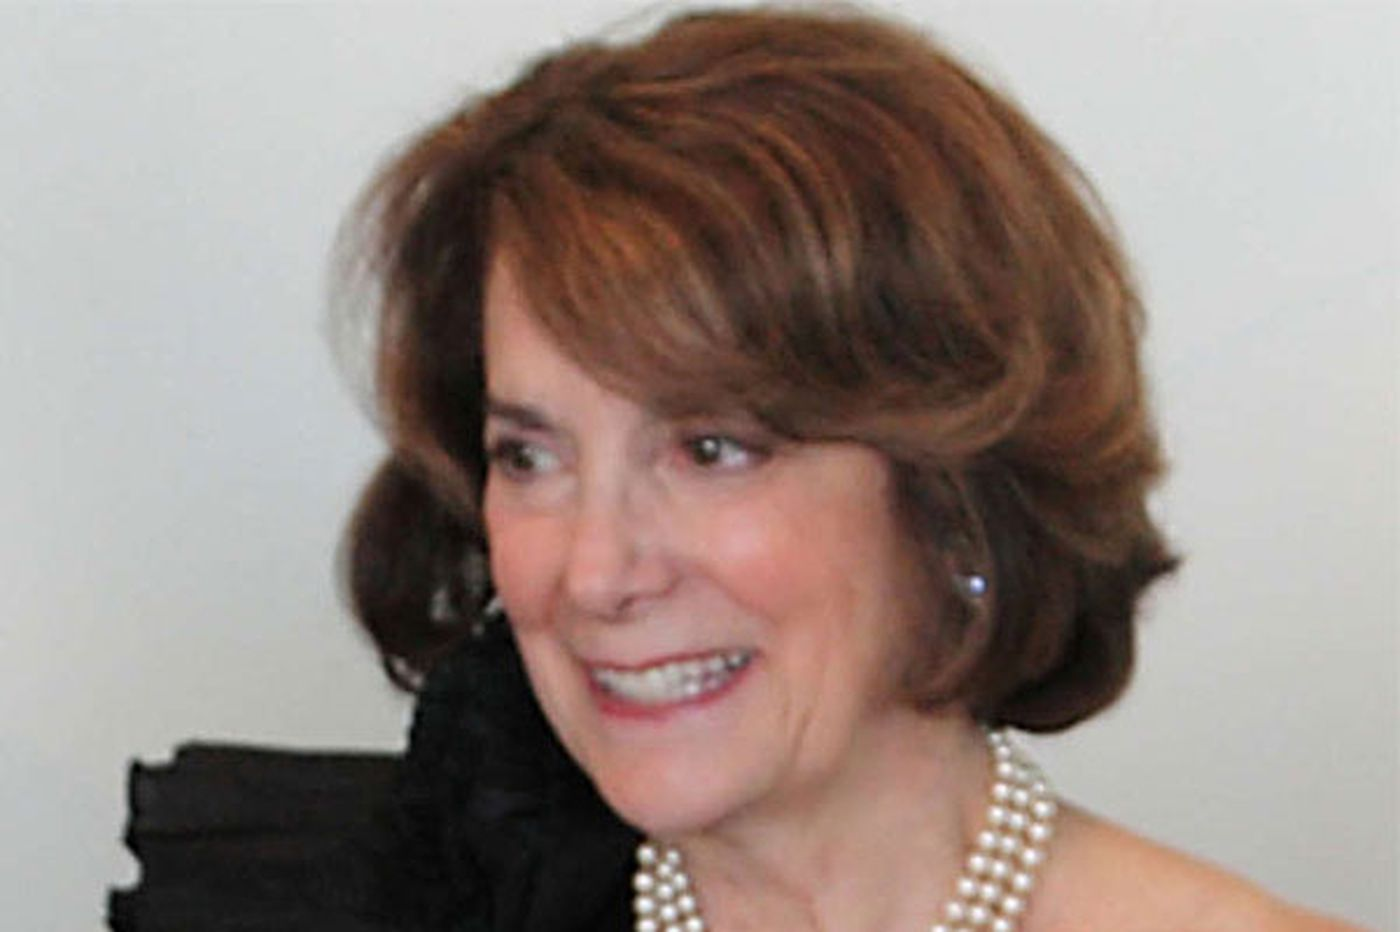 Political judo: Marjorie Margolies turns weakness to strength